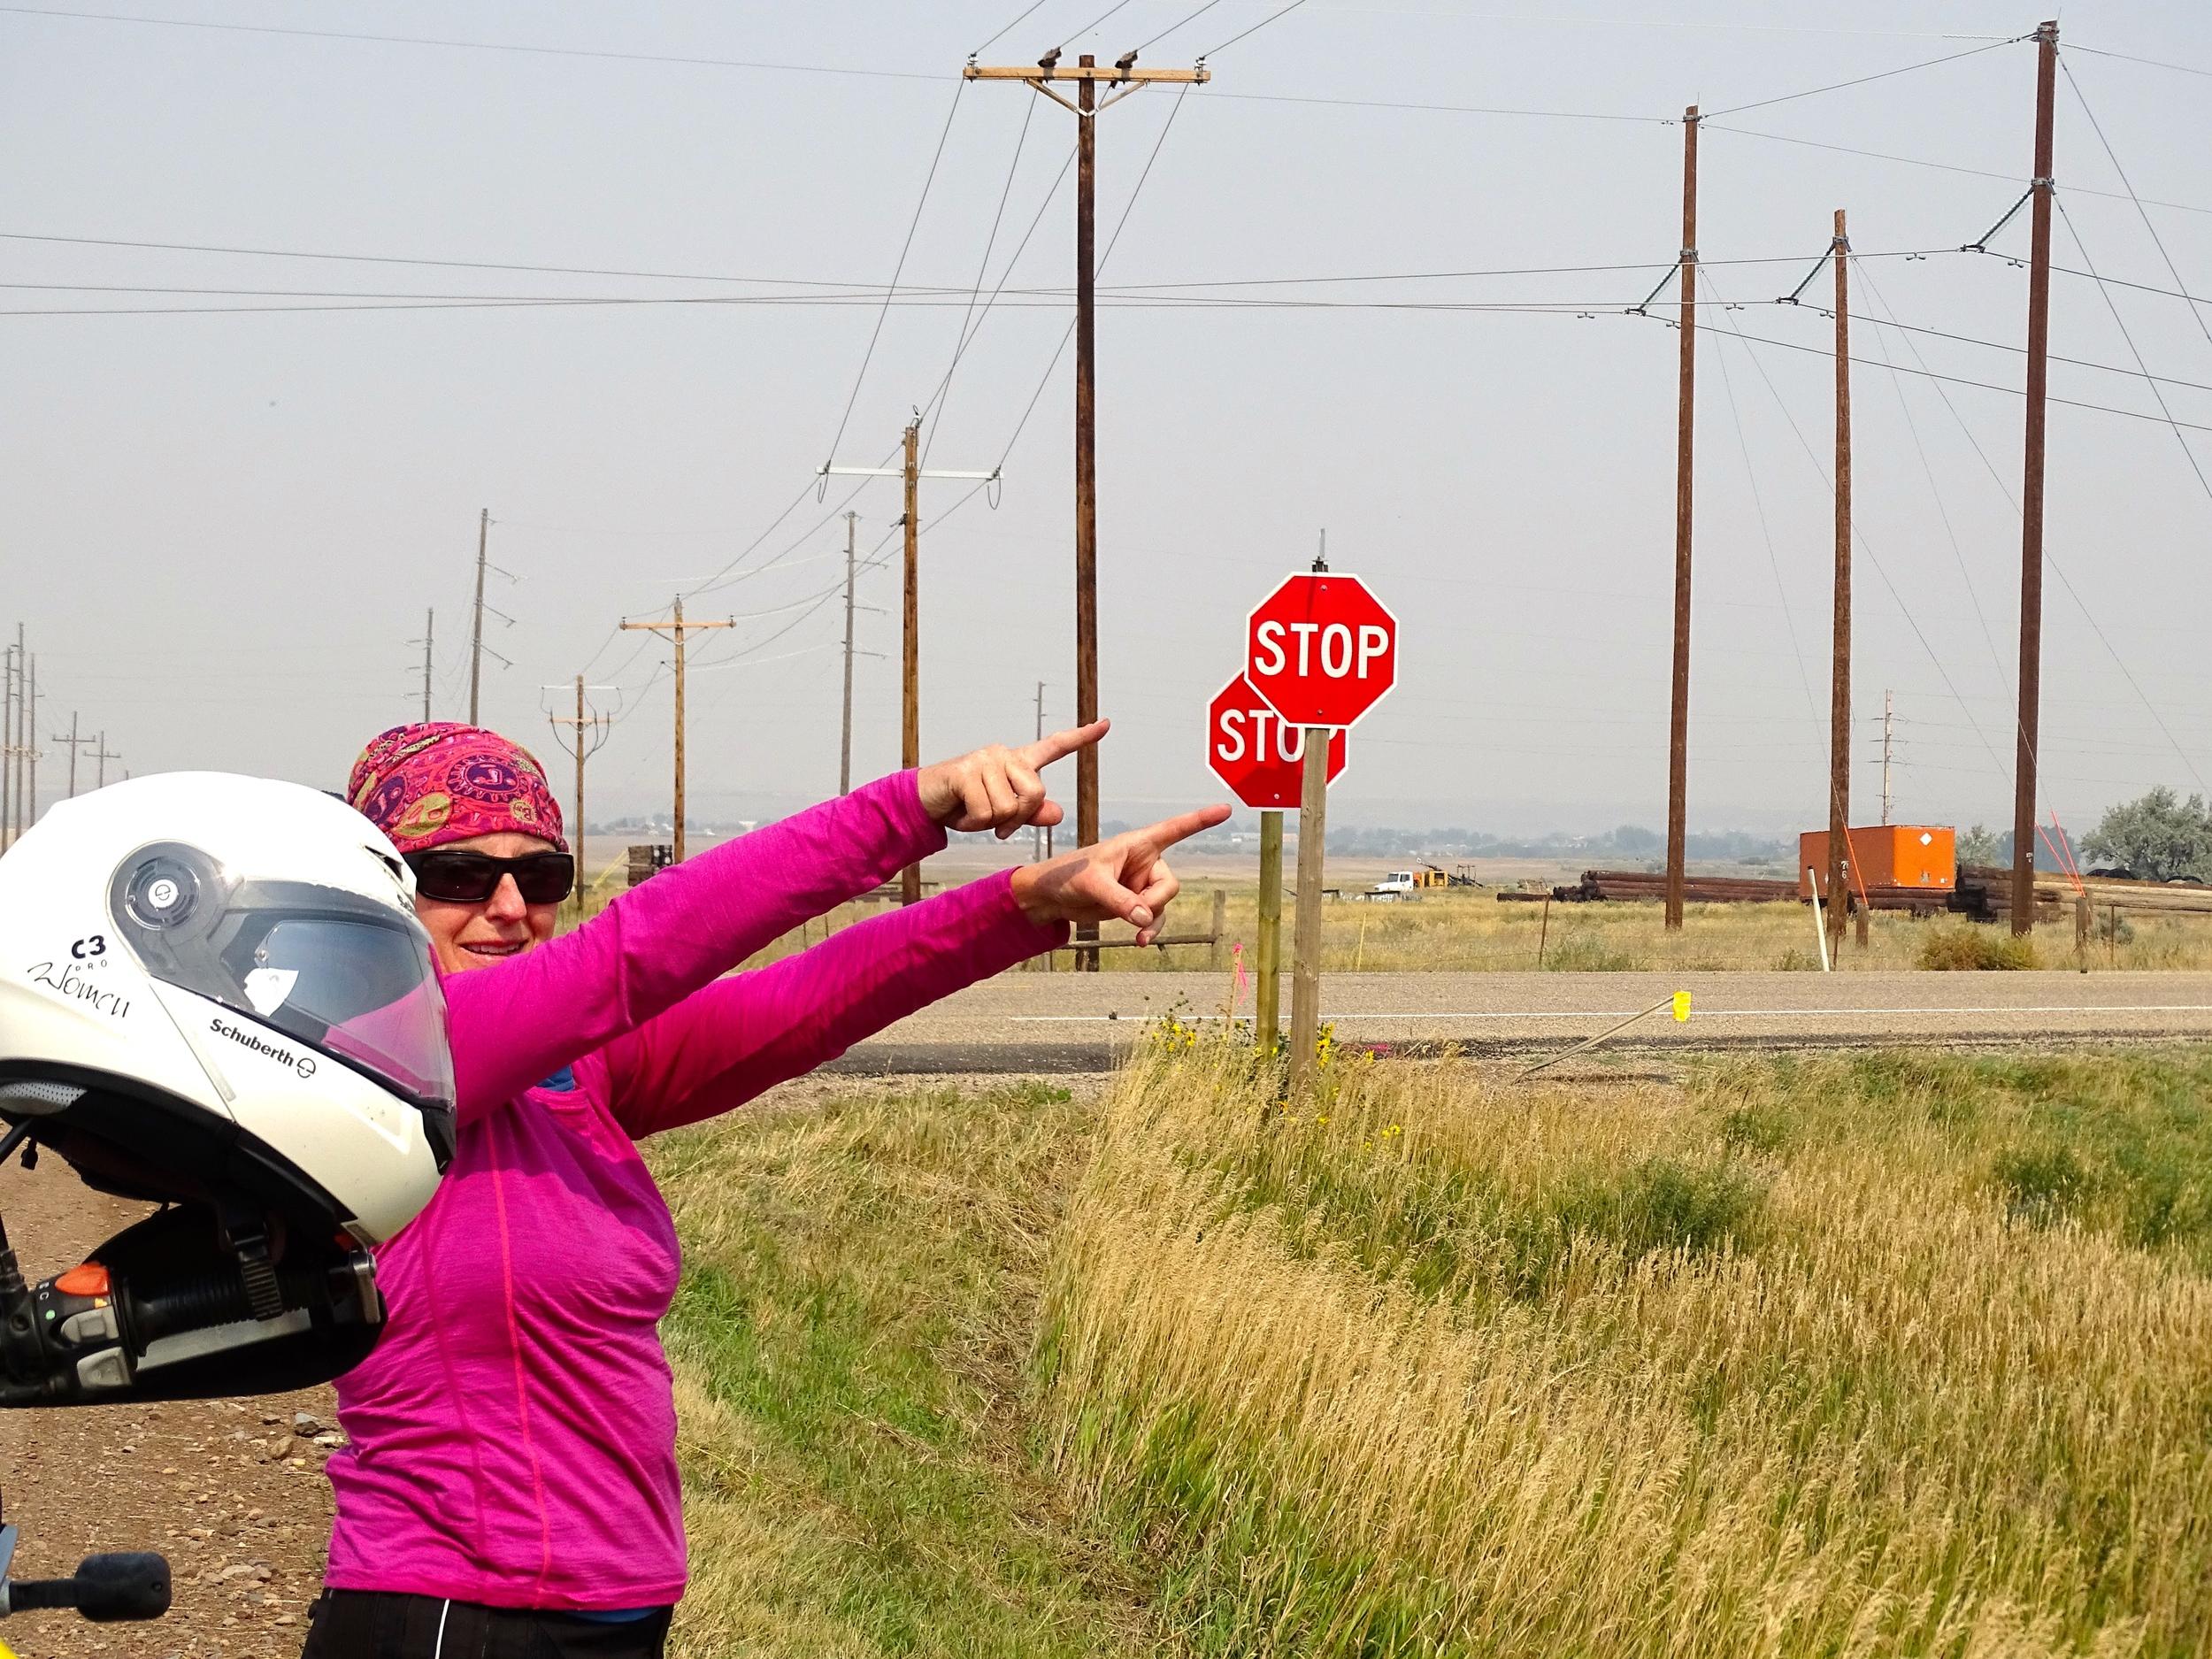 Stop - Stop